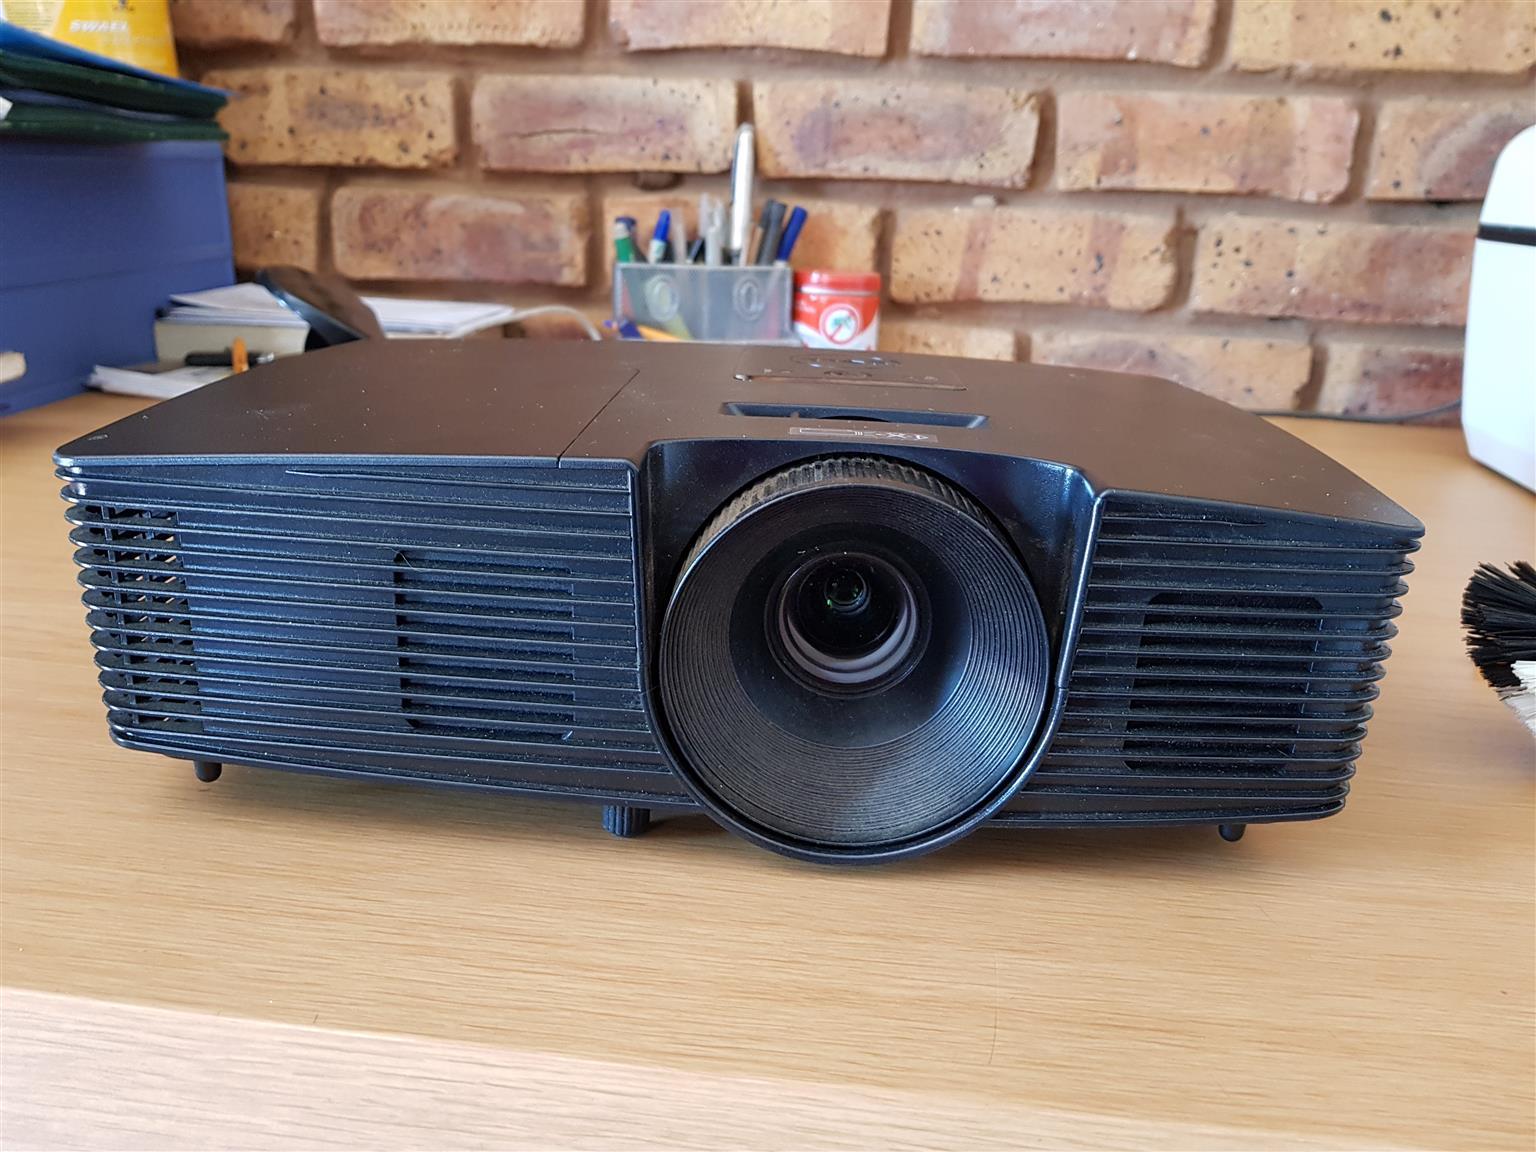 Dell 1220 projector and remote